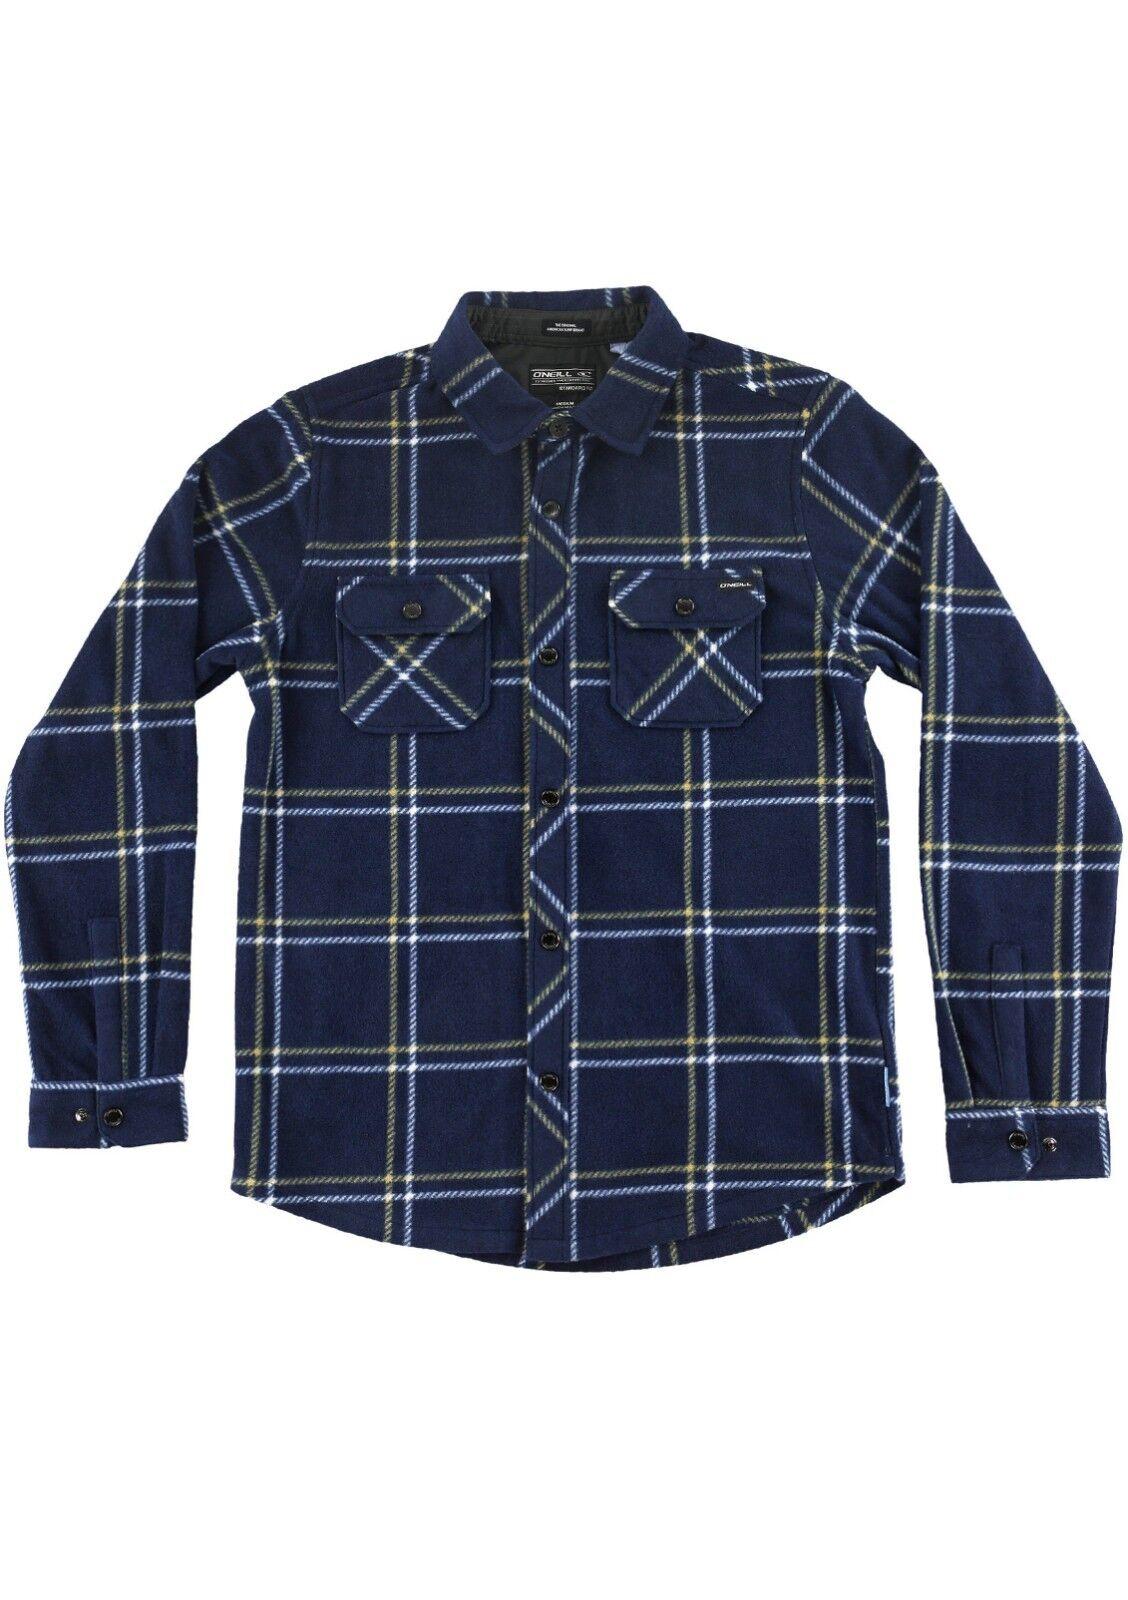 O'Neill Glacier Series Two Shirt (M) Navy